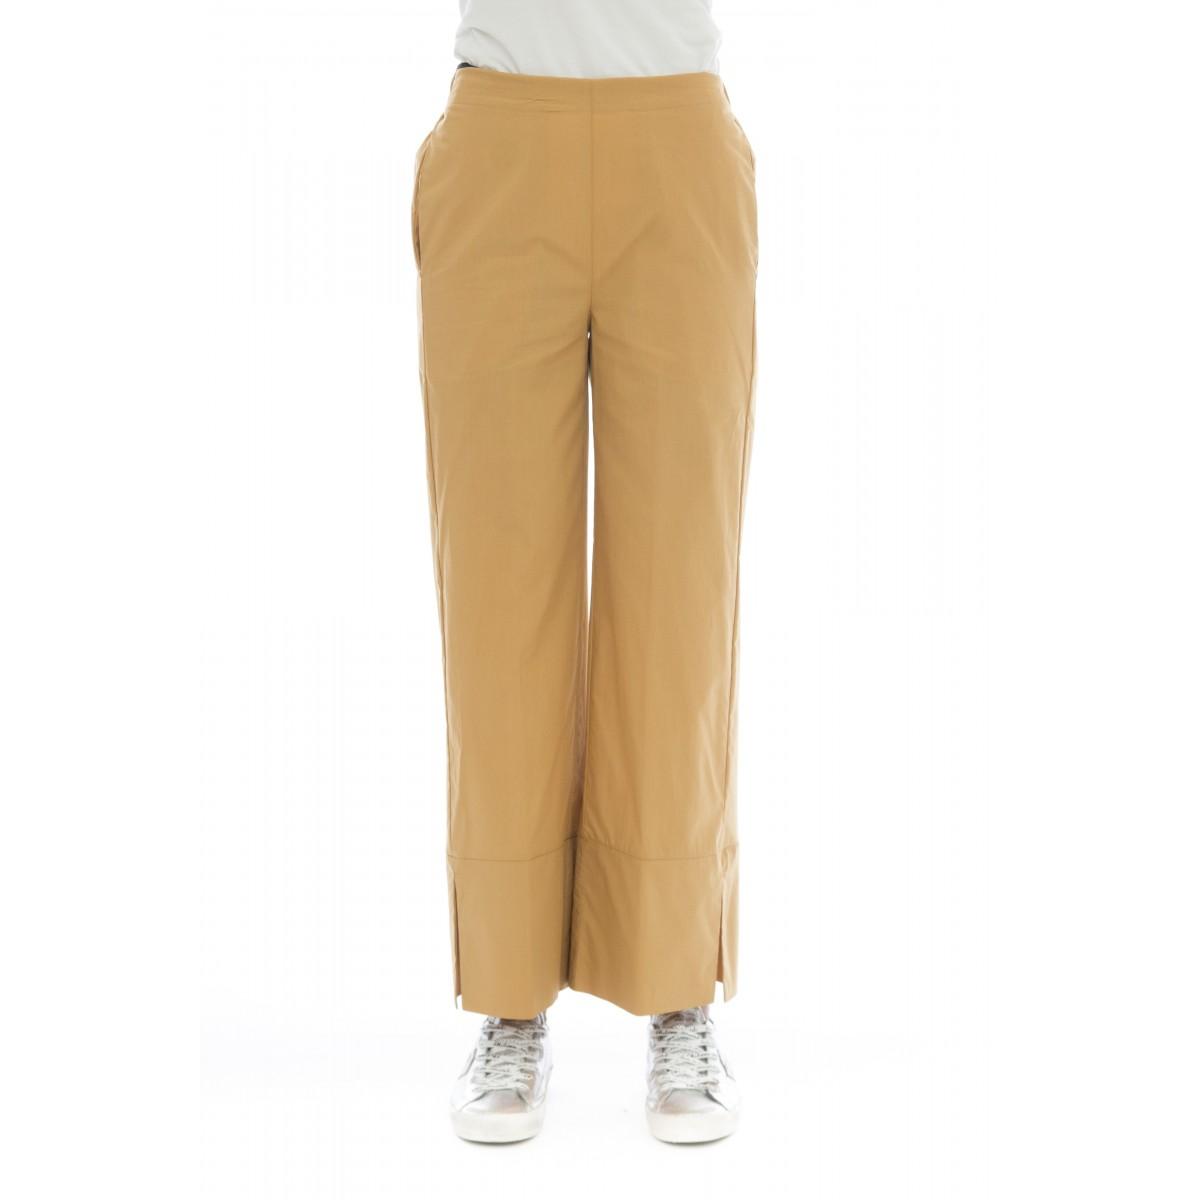 Pantalone donna - J4131 pantalone cotone